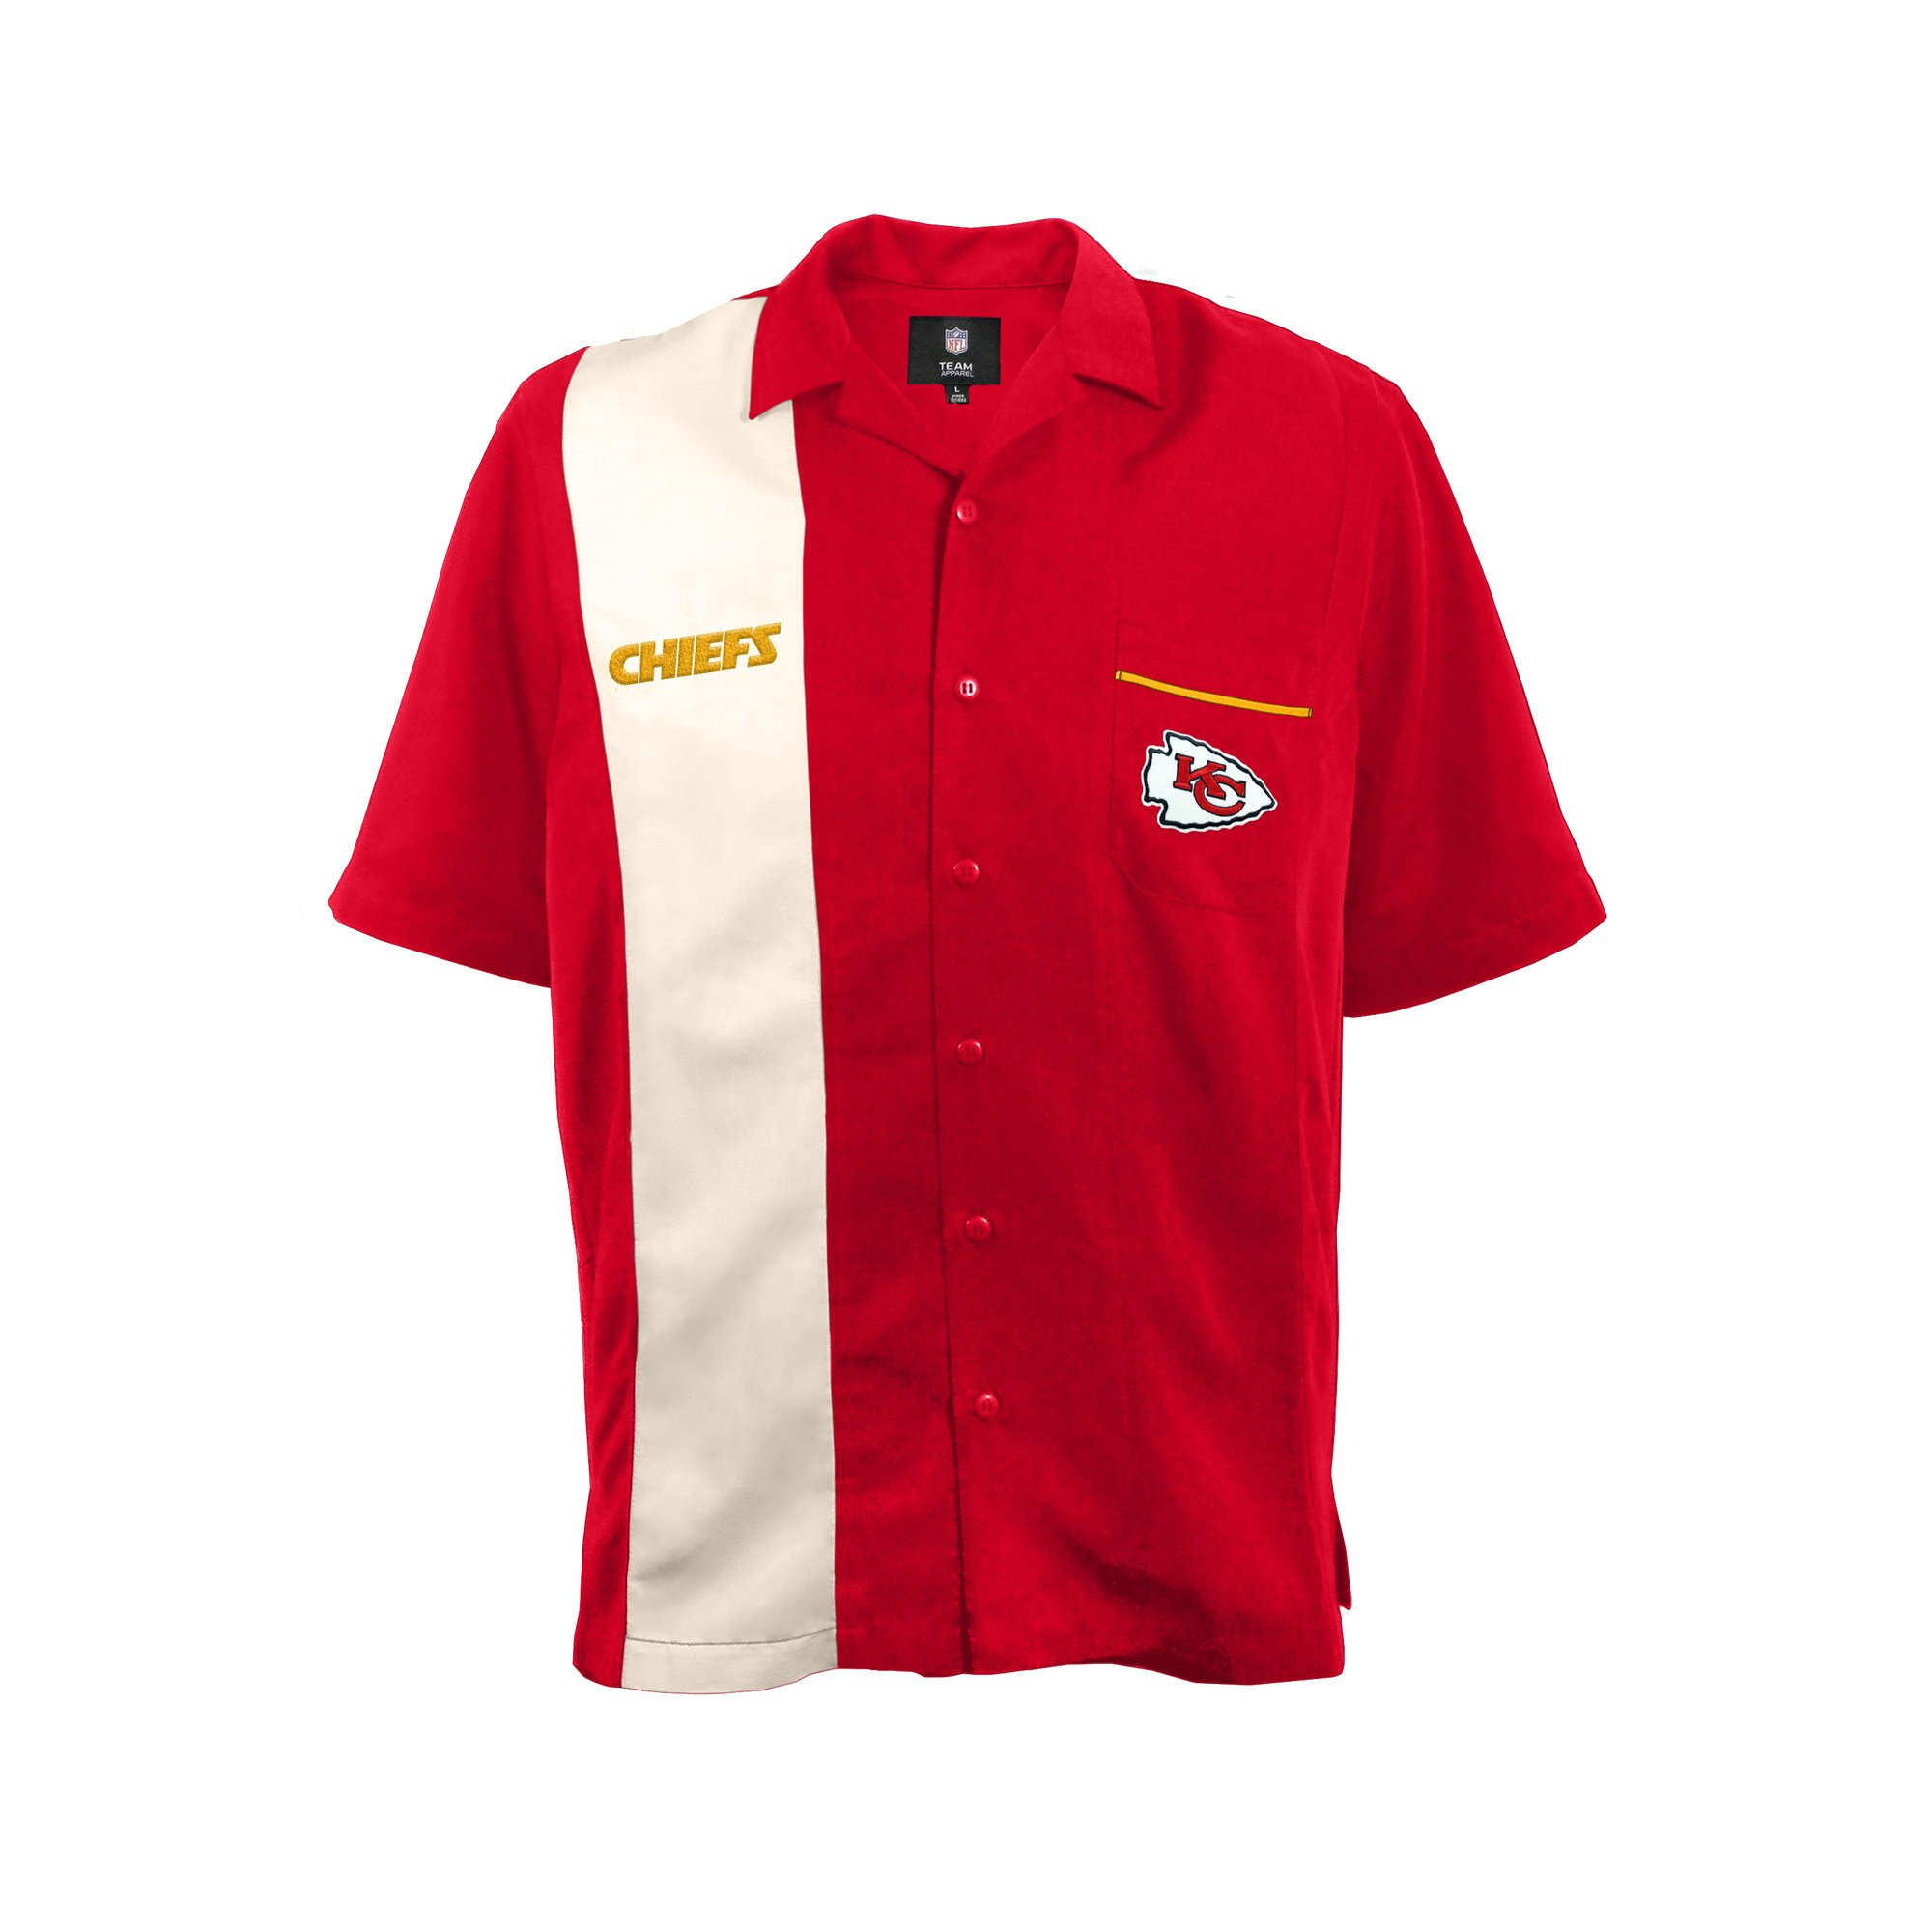 NFL Kansas City Chiefs Strike Bowling Shirt, Medium by Littlearth